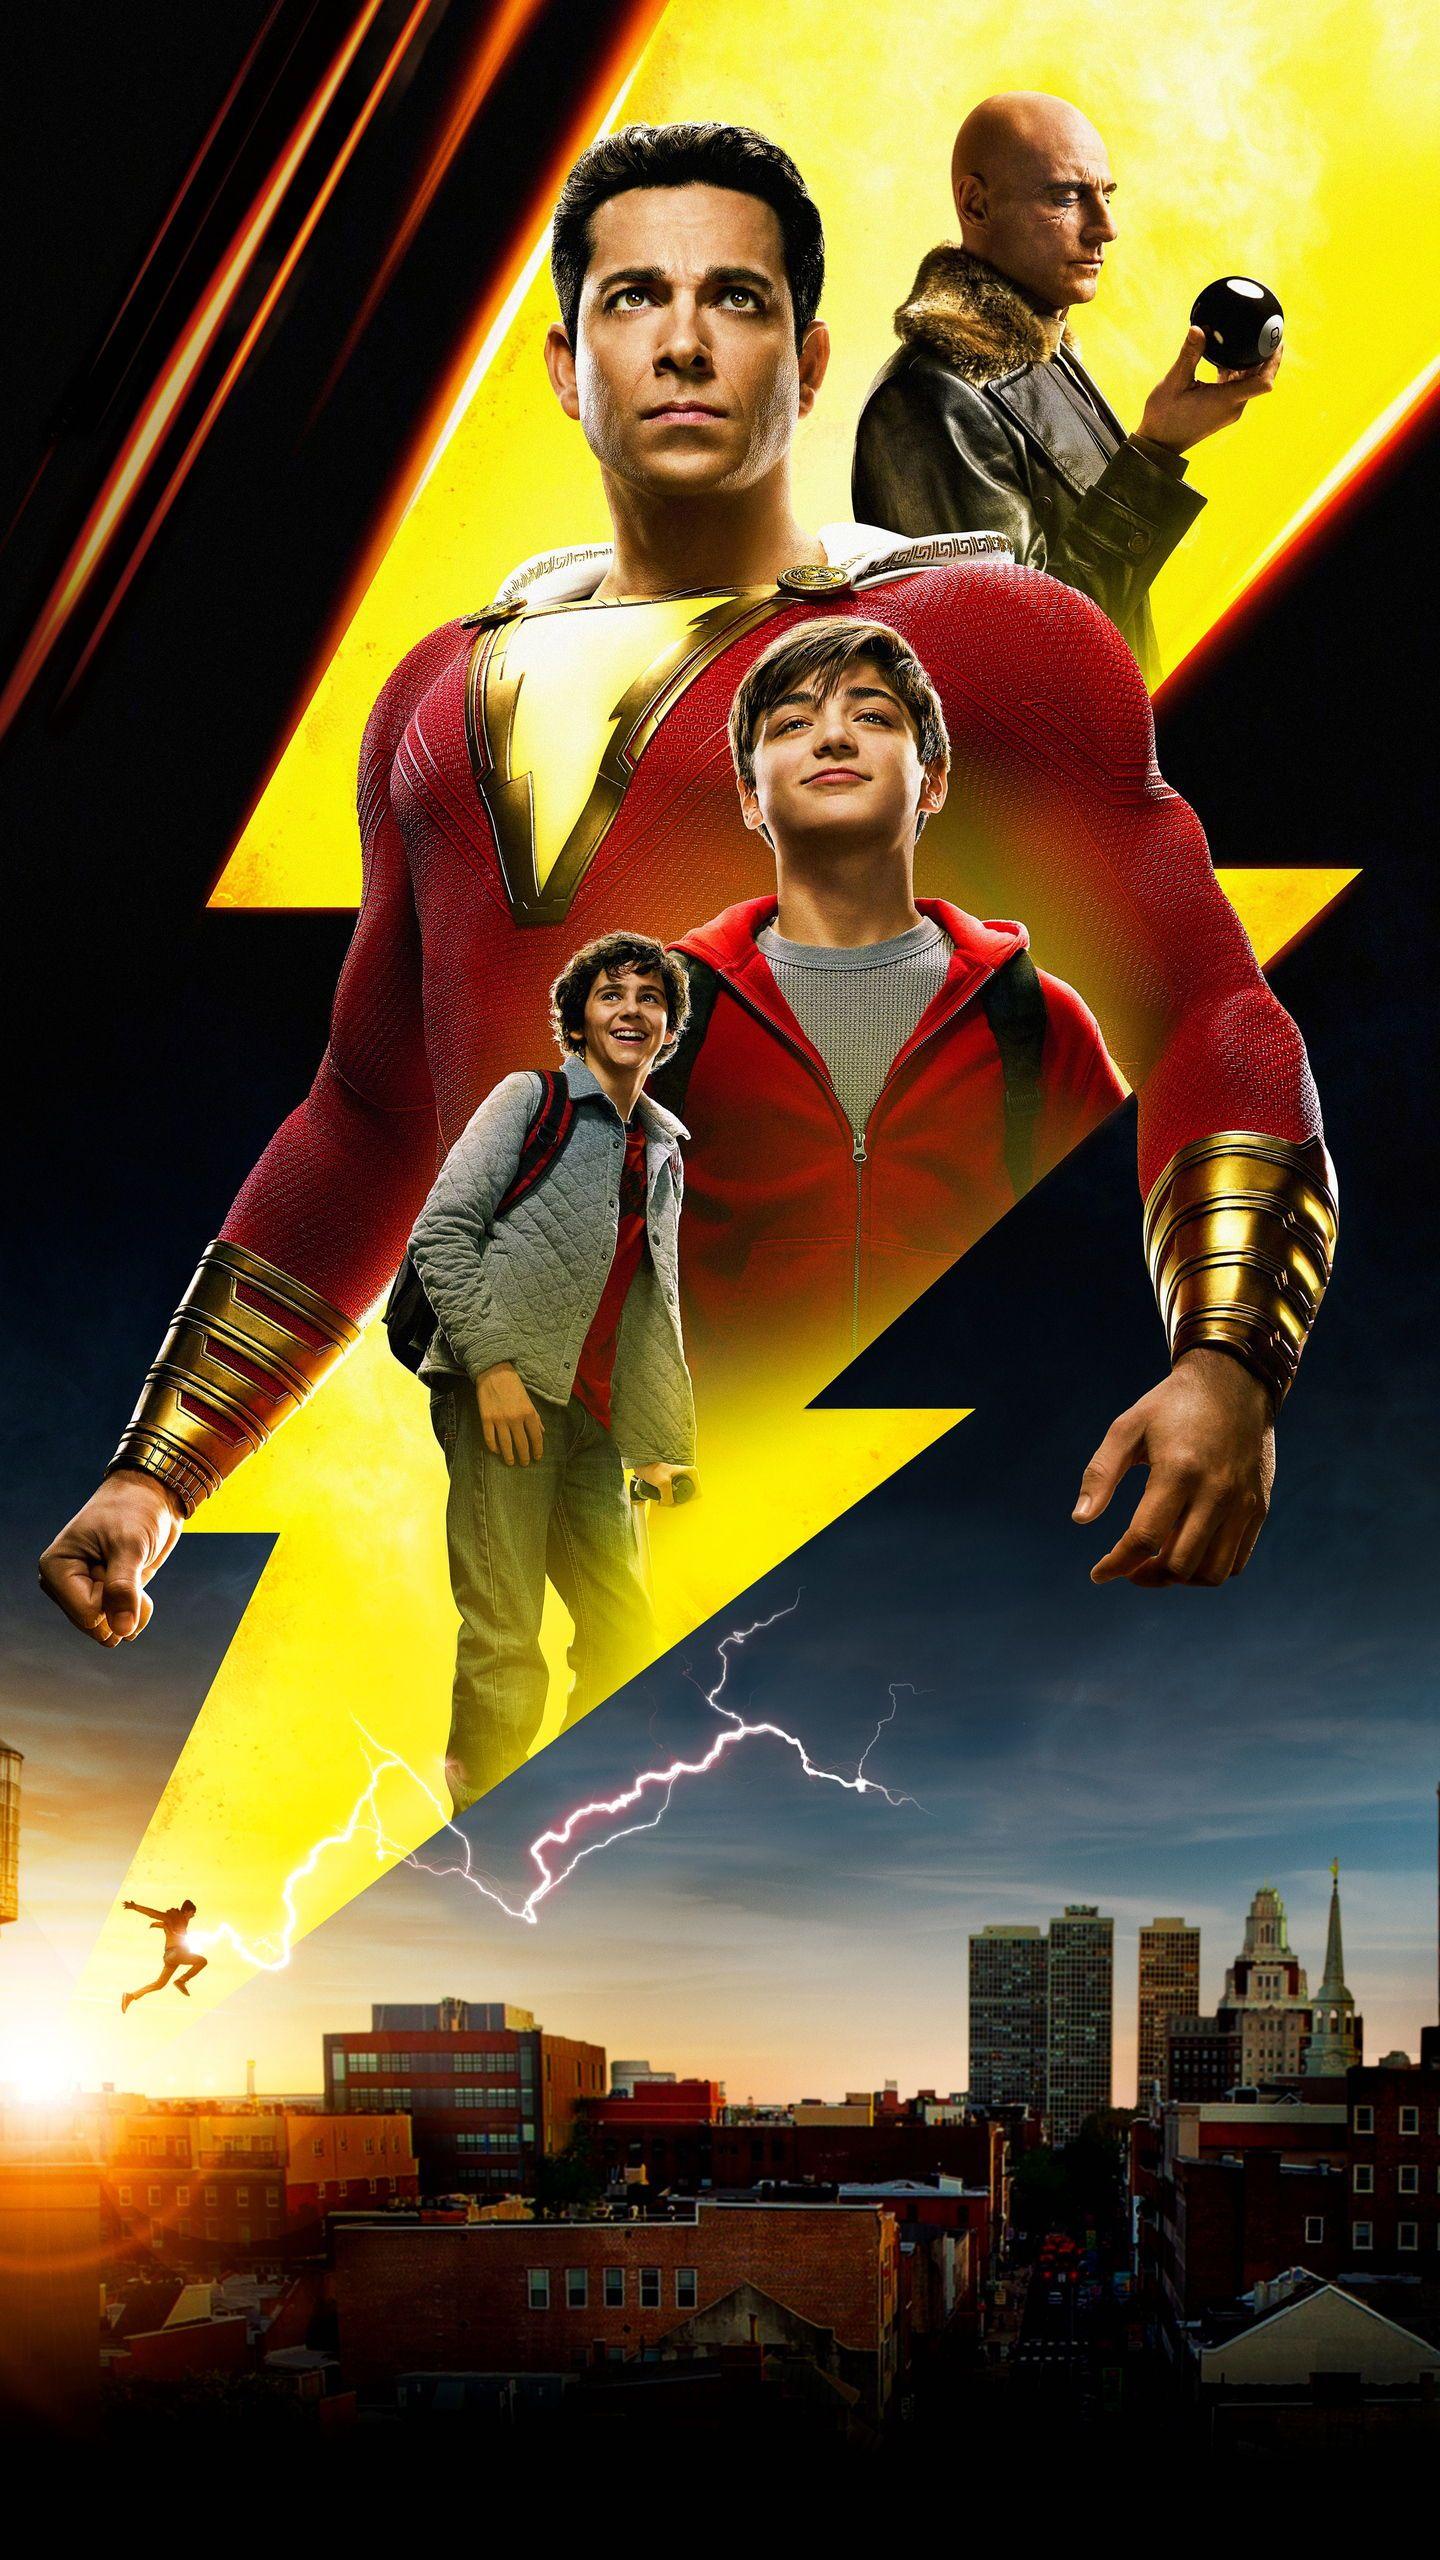 Can You Qualify This Shazam Quiz Take The Quiz Shazam Shazam Movie Dc Comics